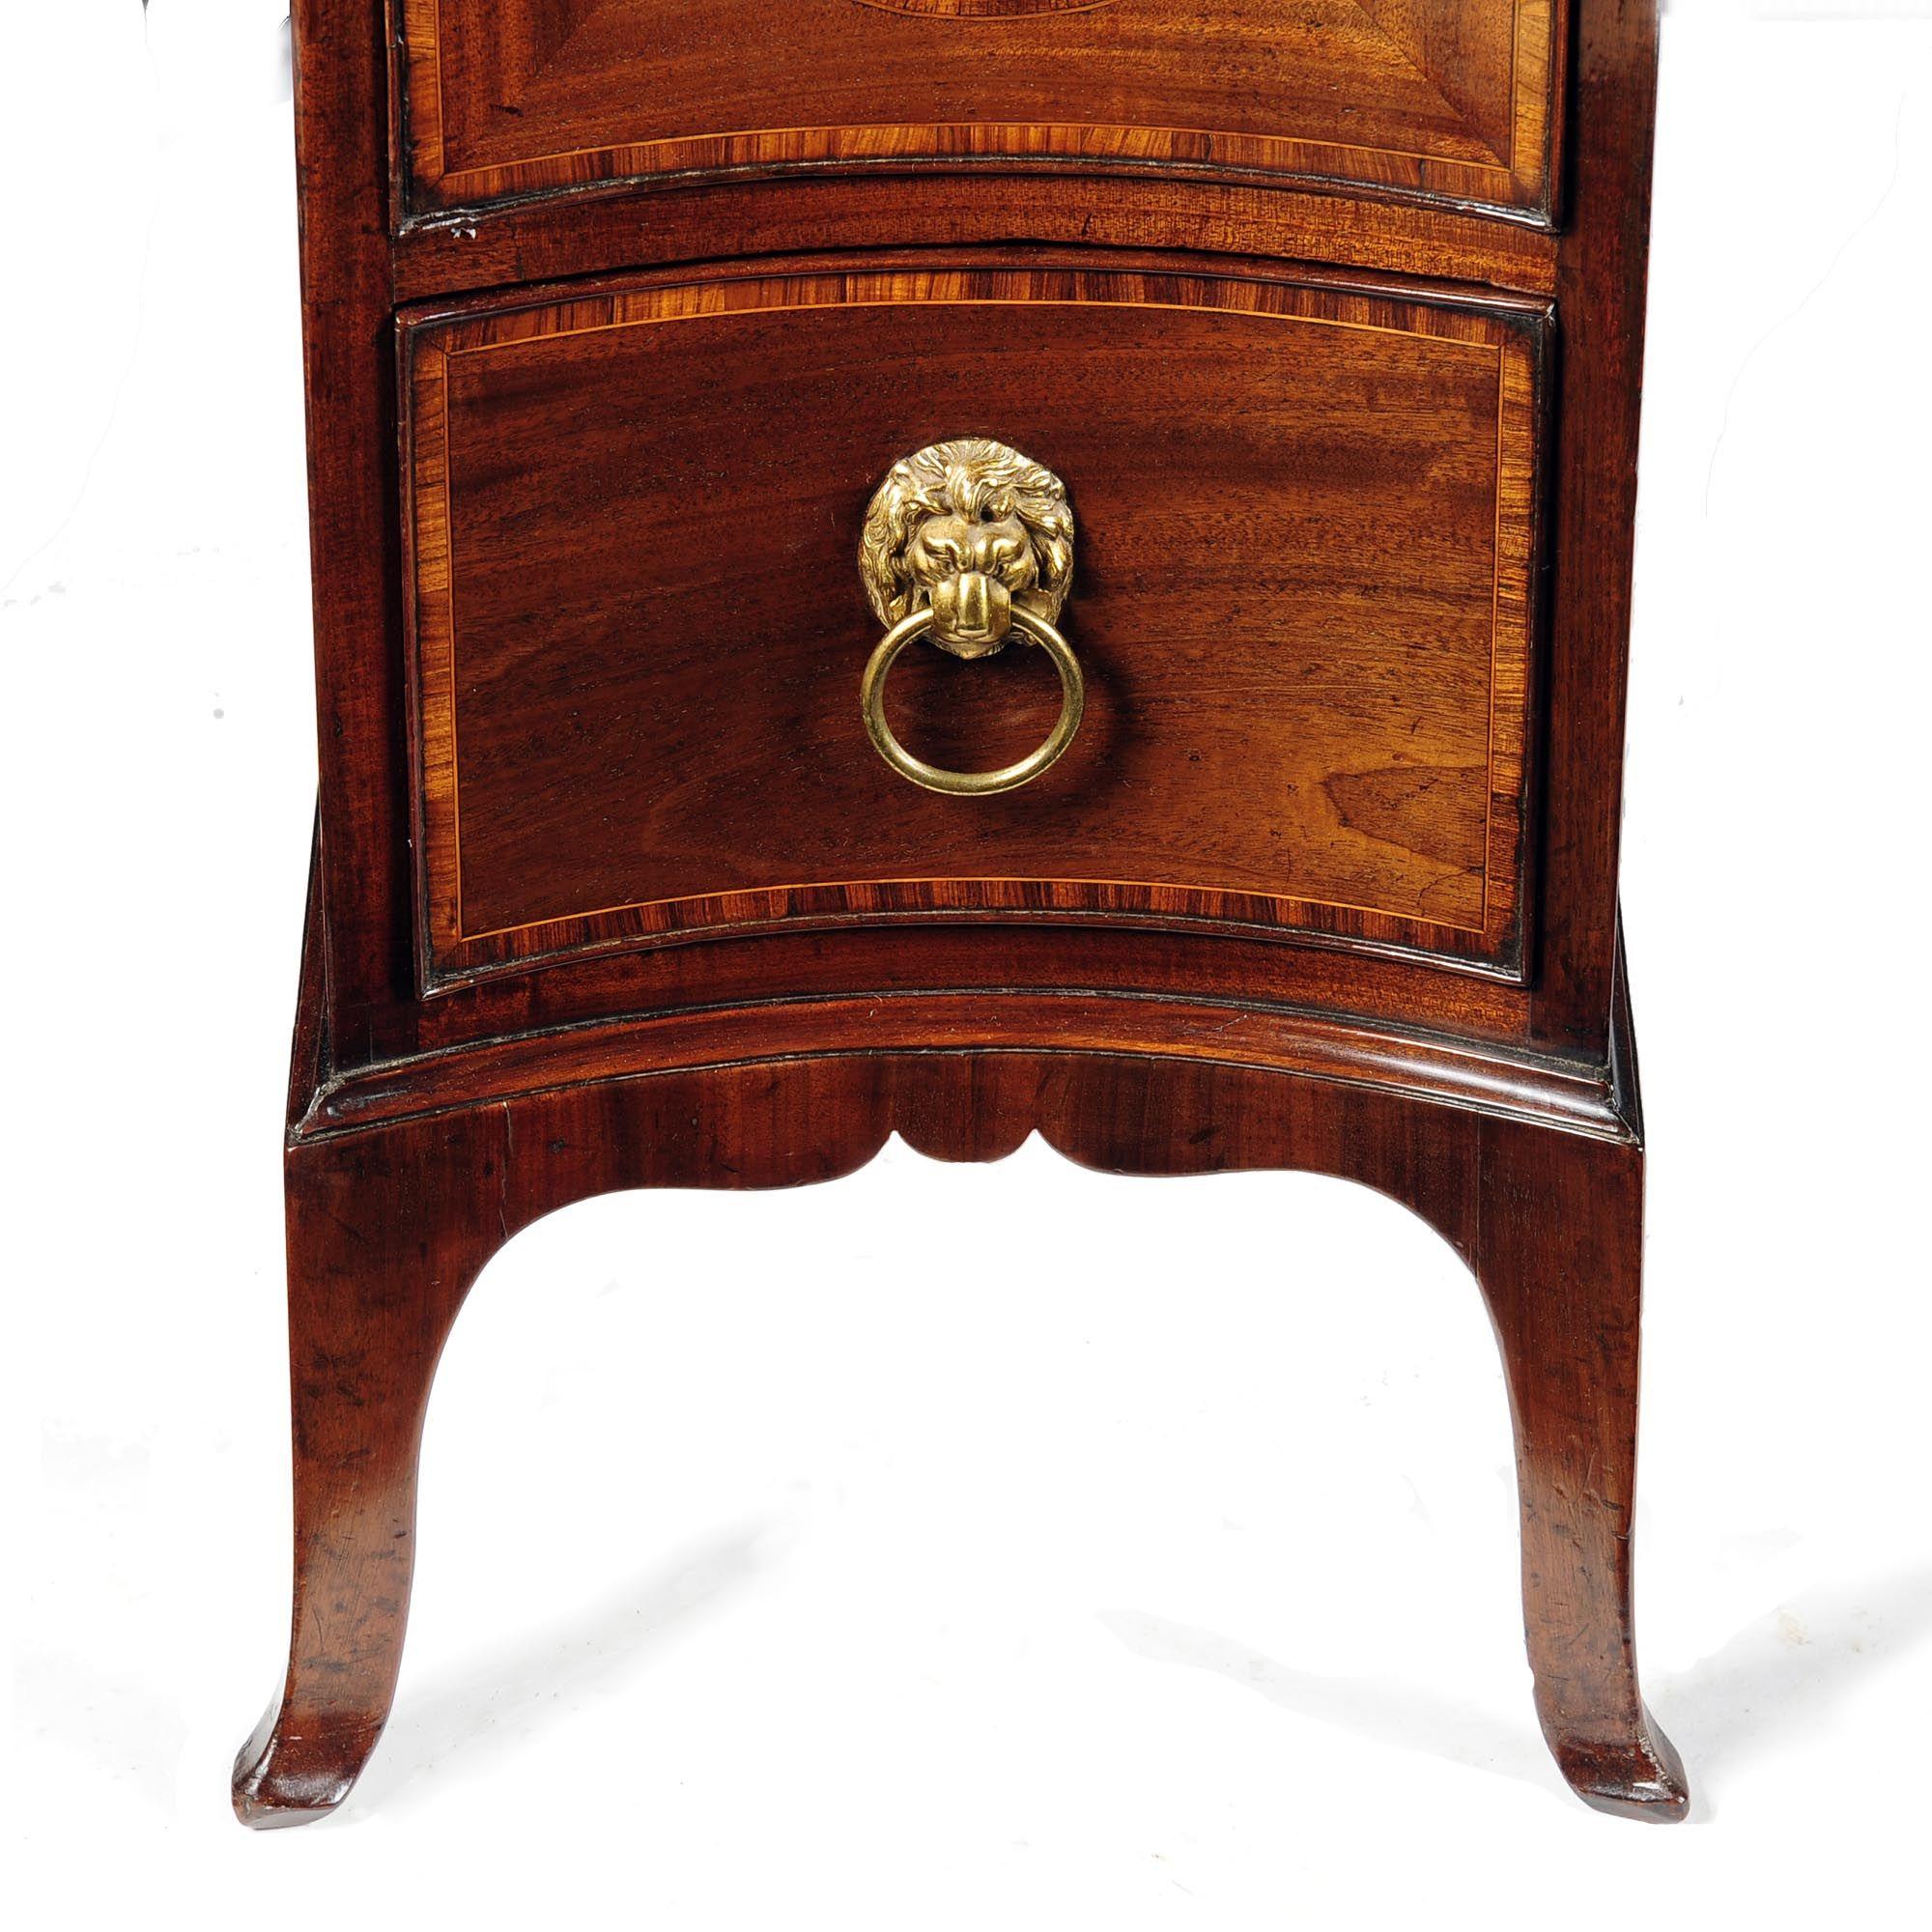 hepplewhite furniture   Hepplewhite period mahogany & tulipwood banded serpentine sideboard